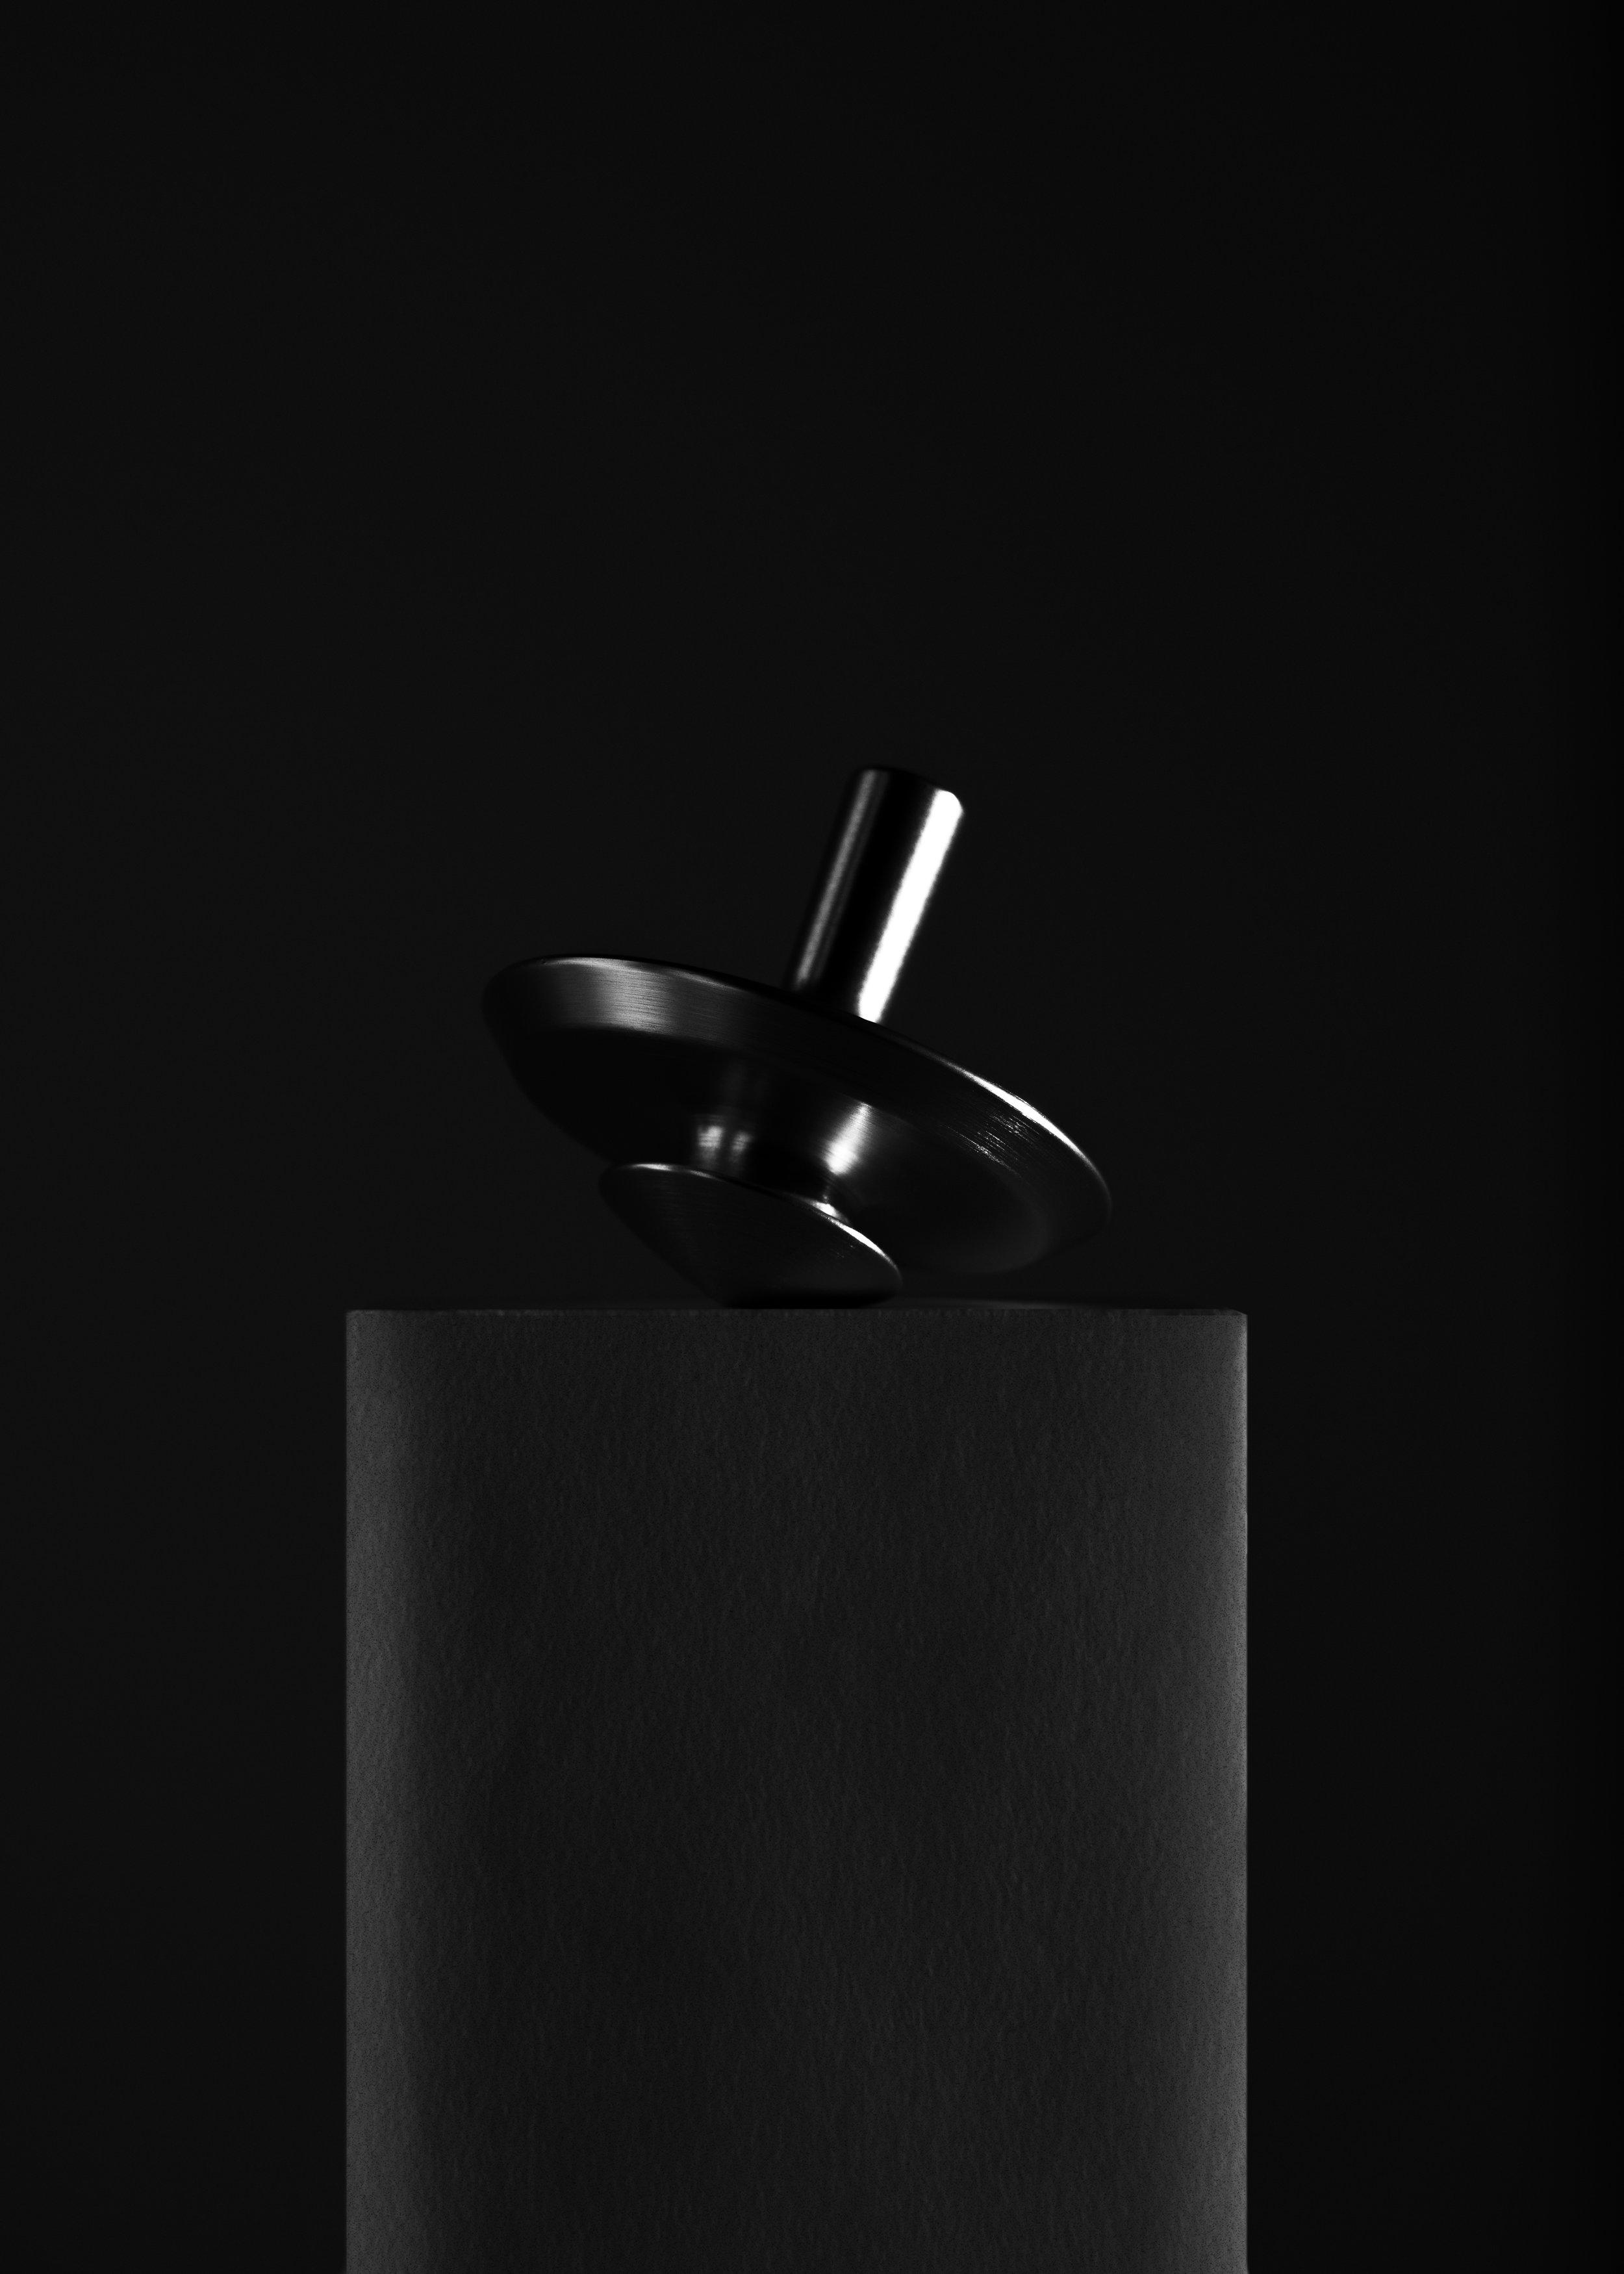 spin-bottle-opener-pedestal-nicholas-baker